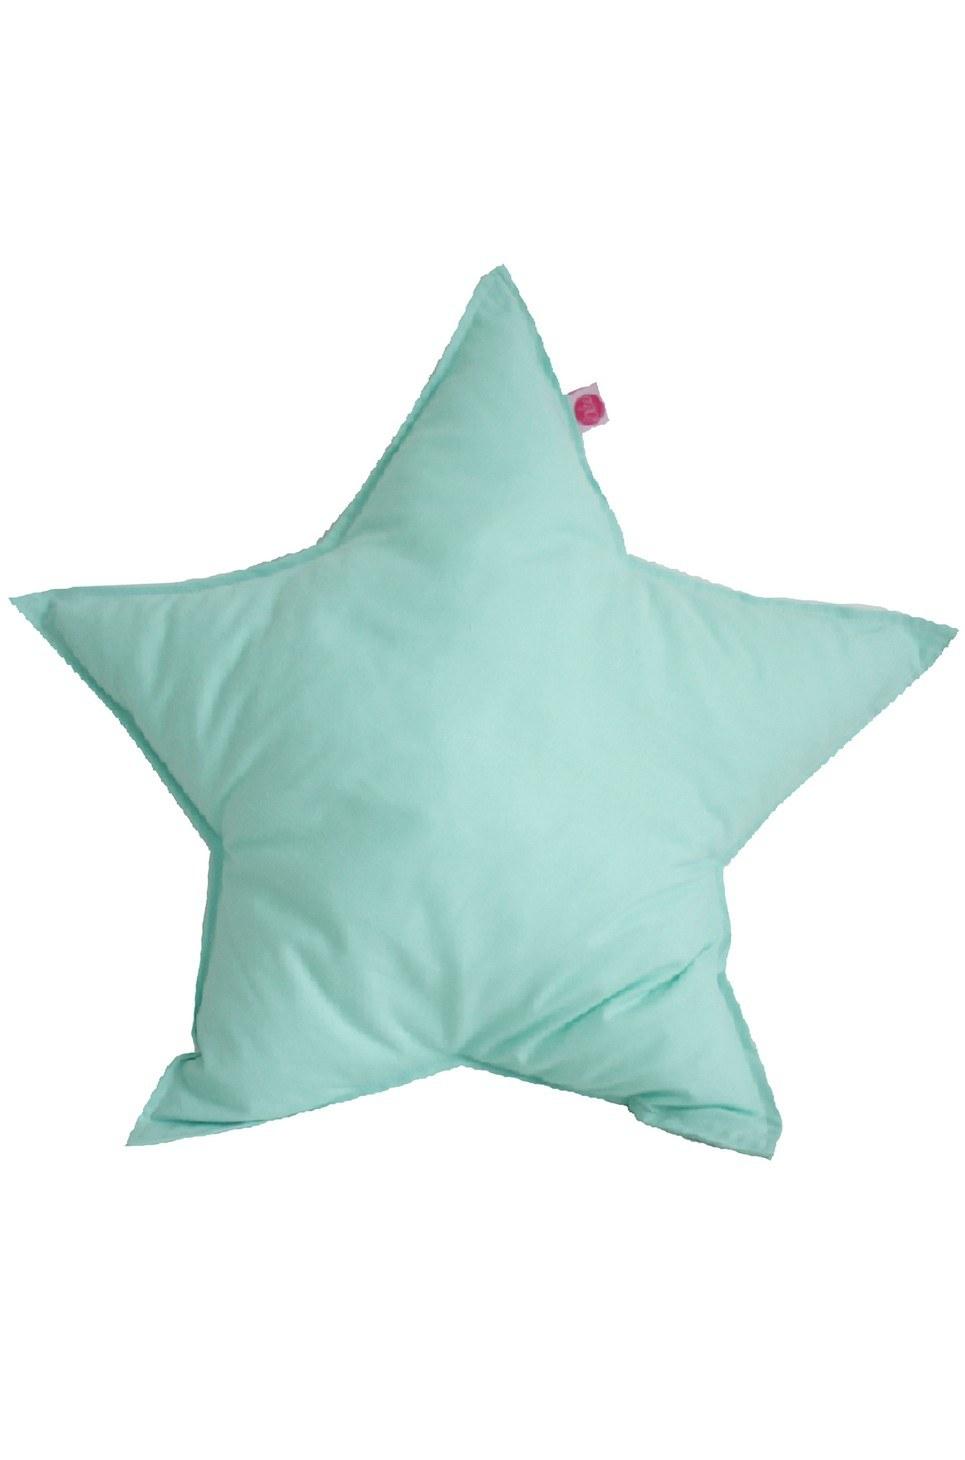 Turquoise Star Children's Cushion